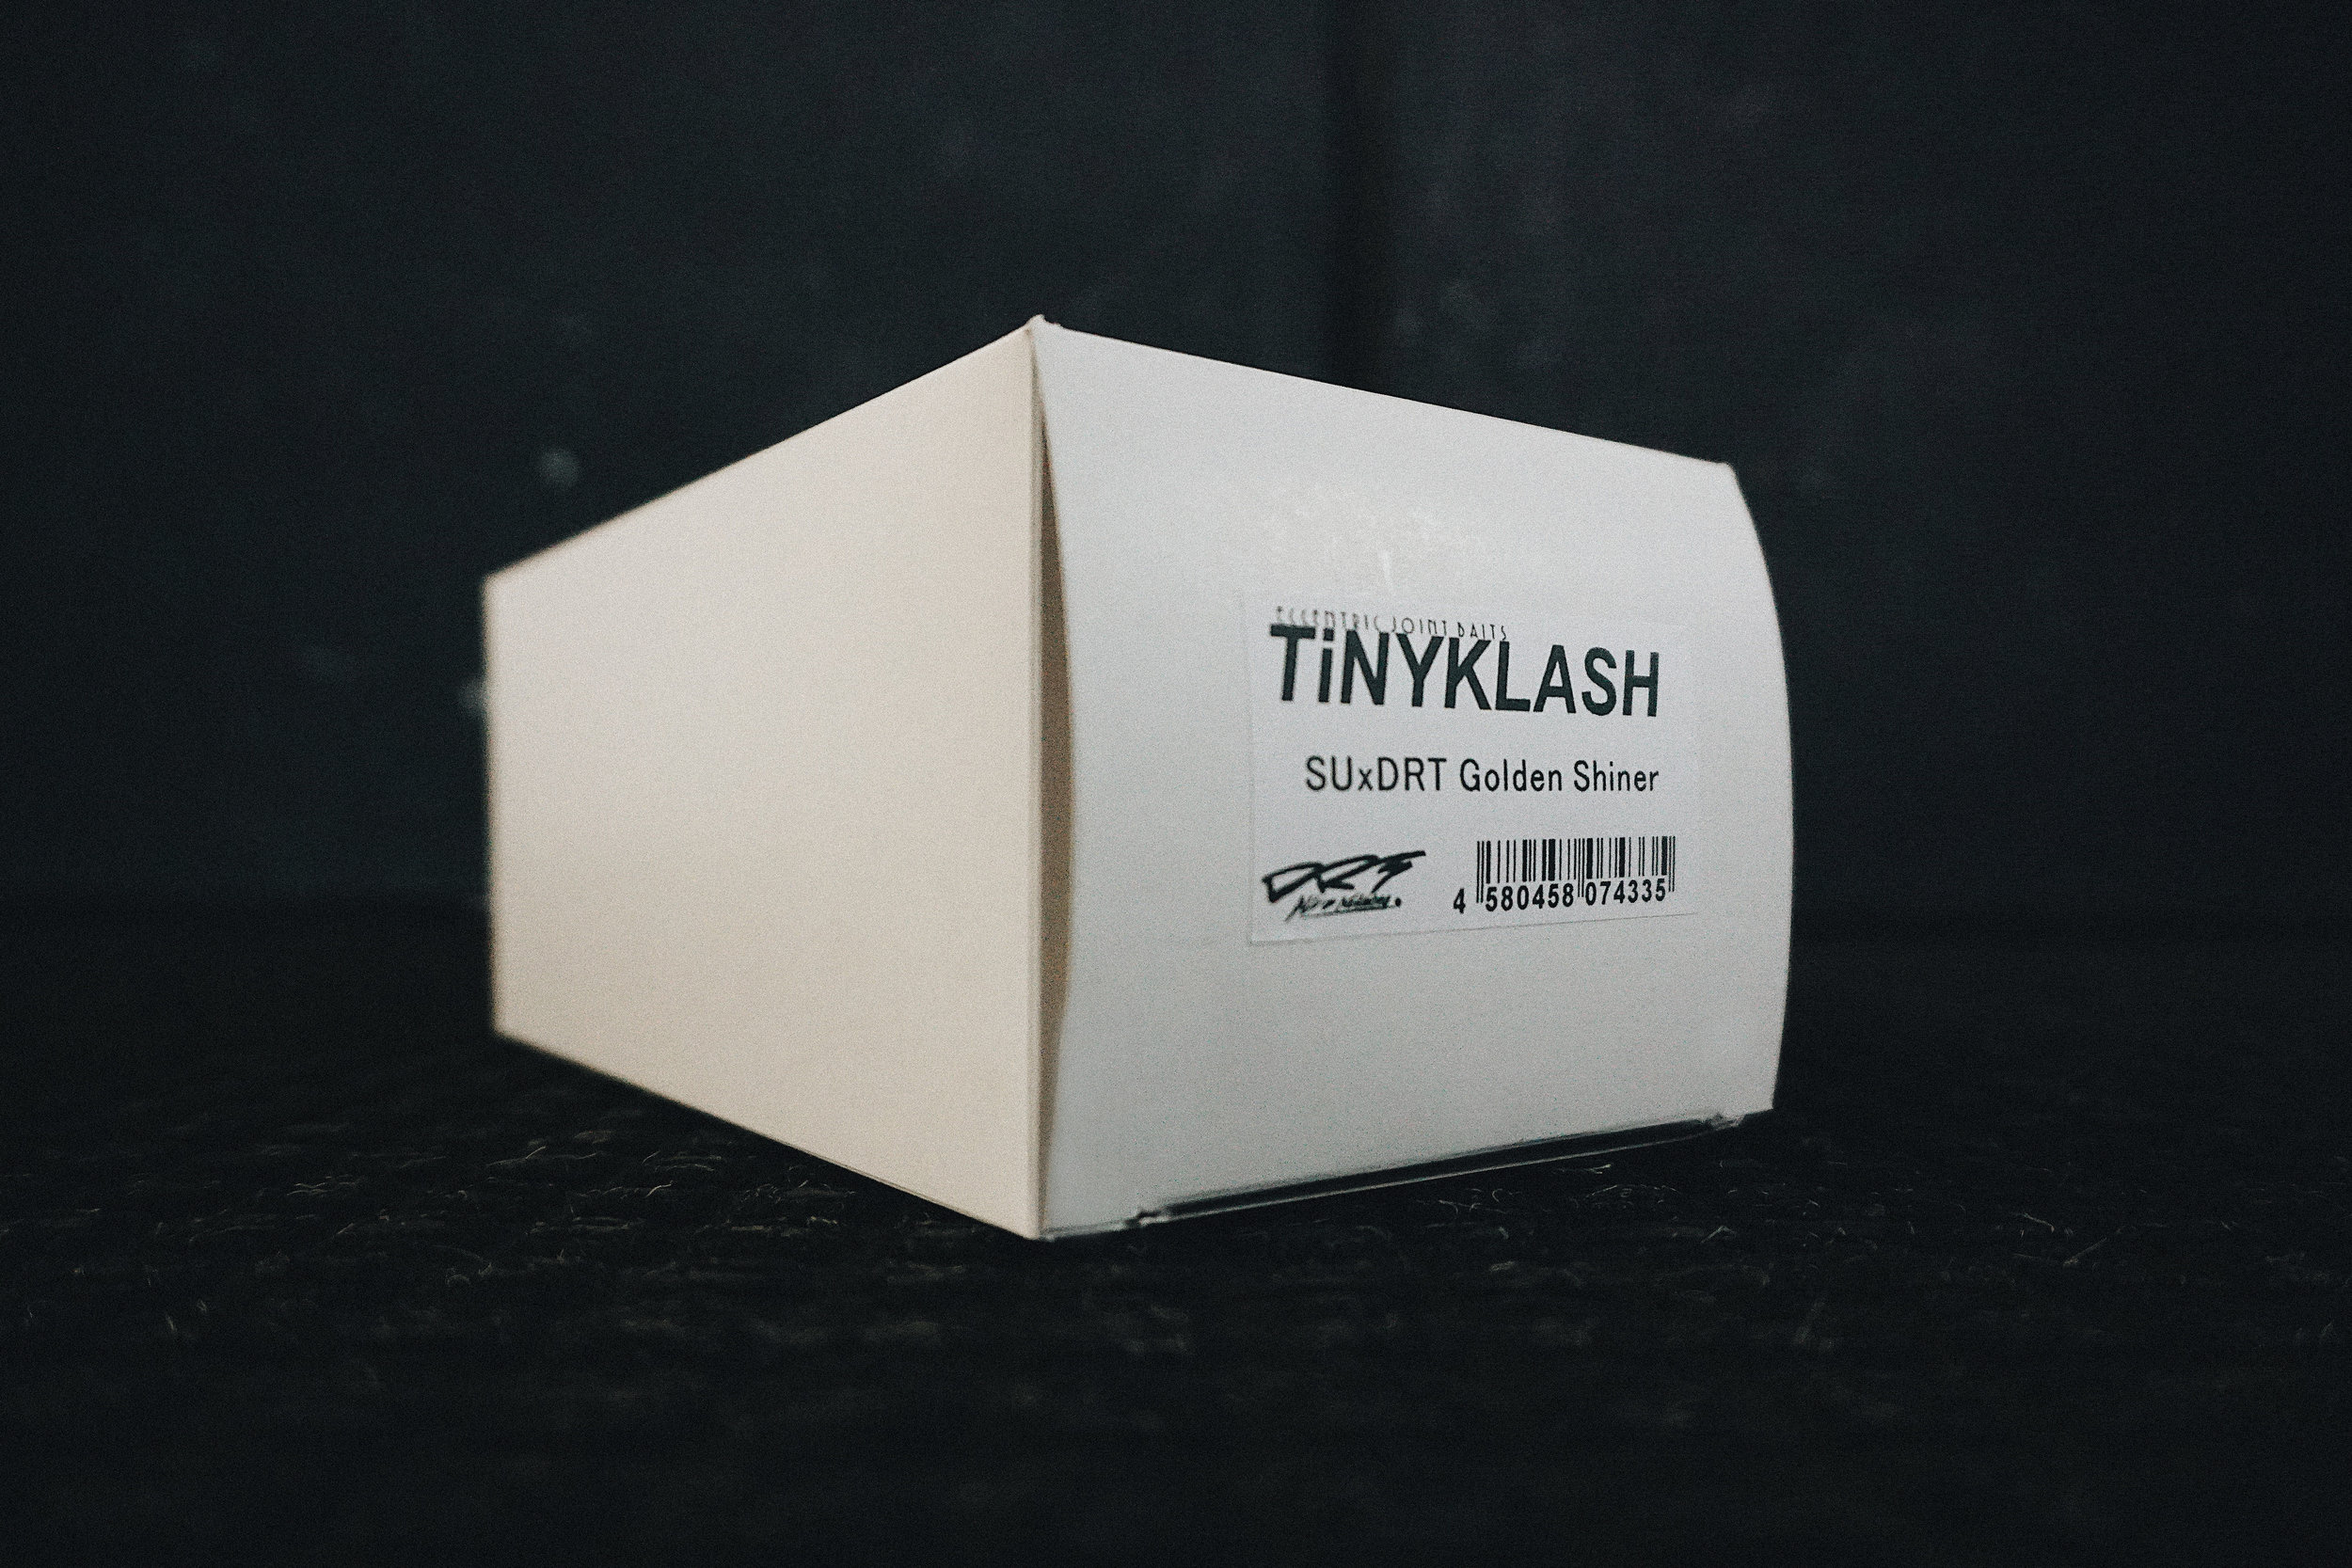 SBSRFC_Swimbait_Underground_DRT_Tiny_Klash_Collaboration_6.jpg